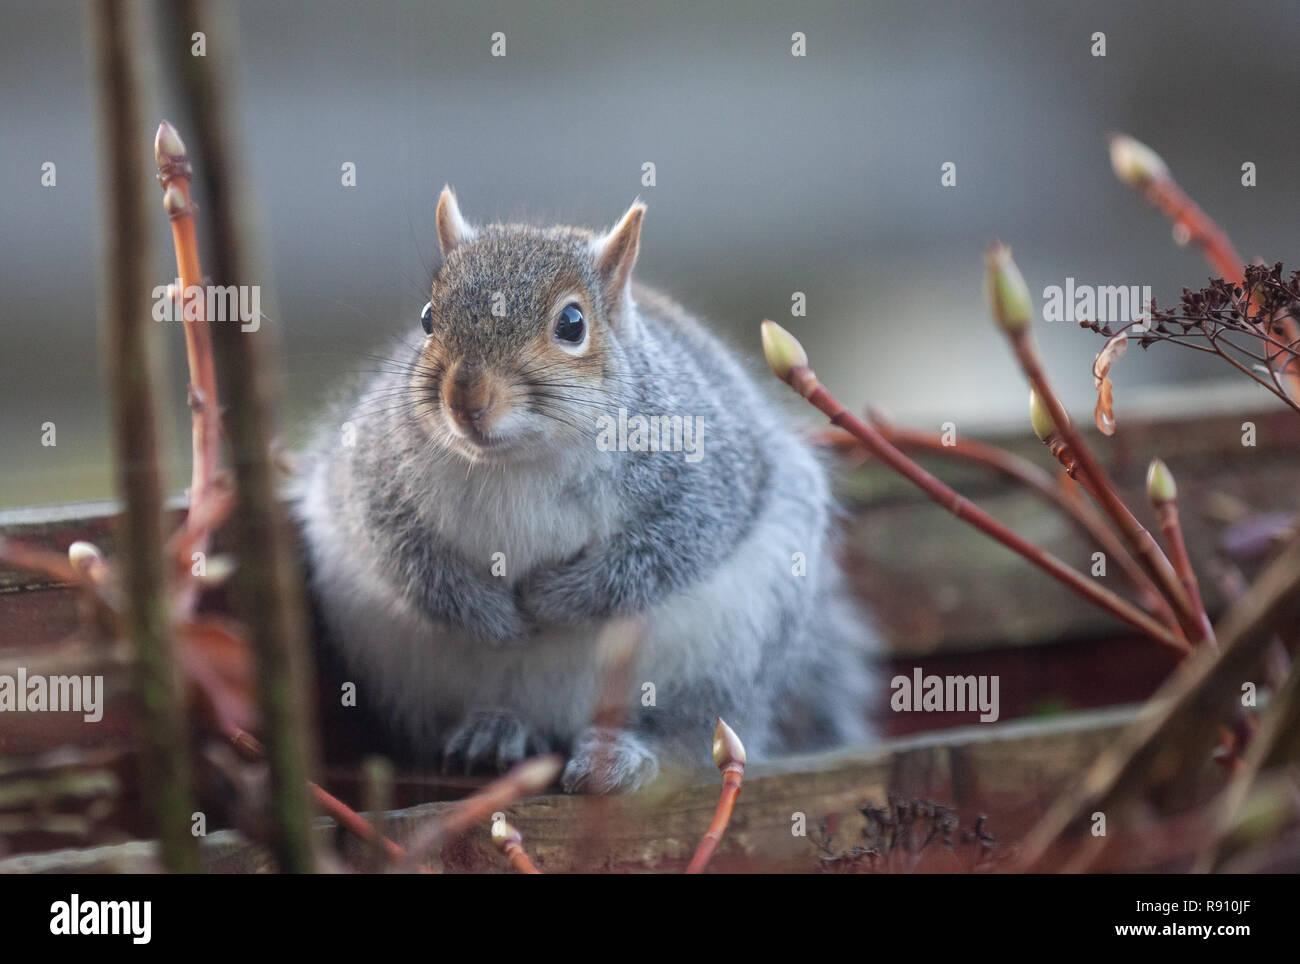 Eastern Grey Squirrel Sciurus carolinensis sitting on a garden fence in a Scottish Garden. - Stock Image